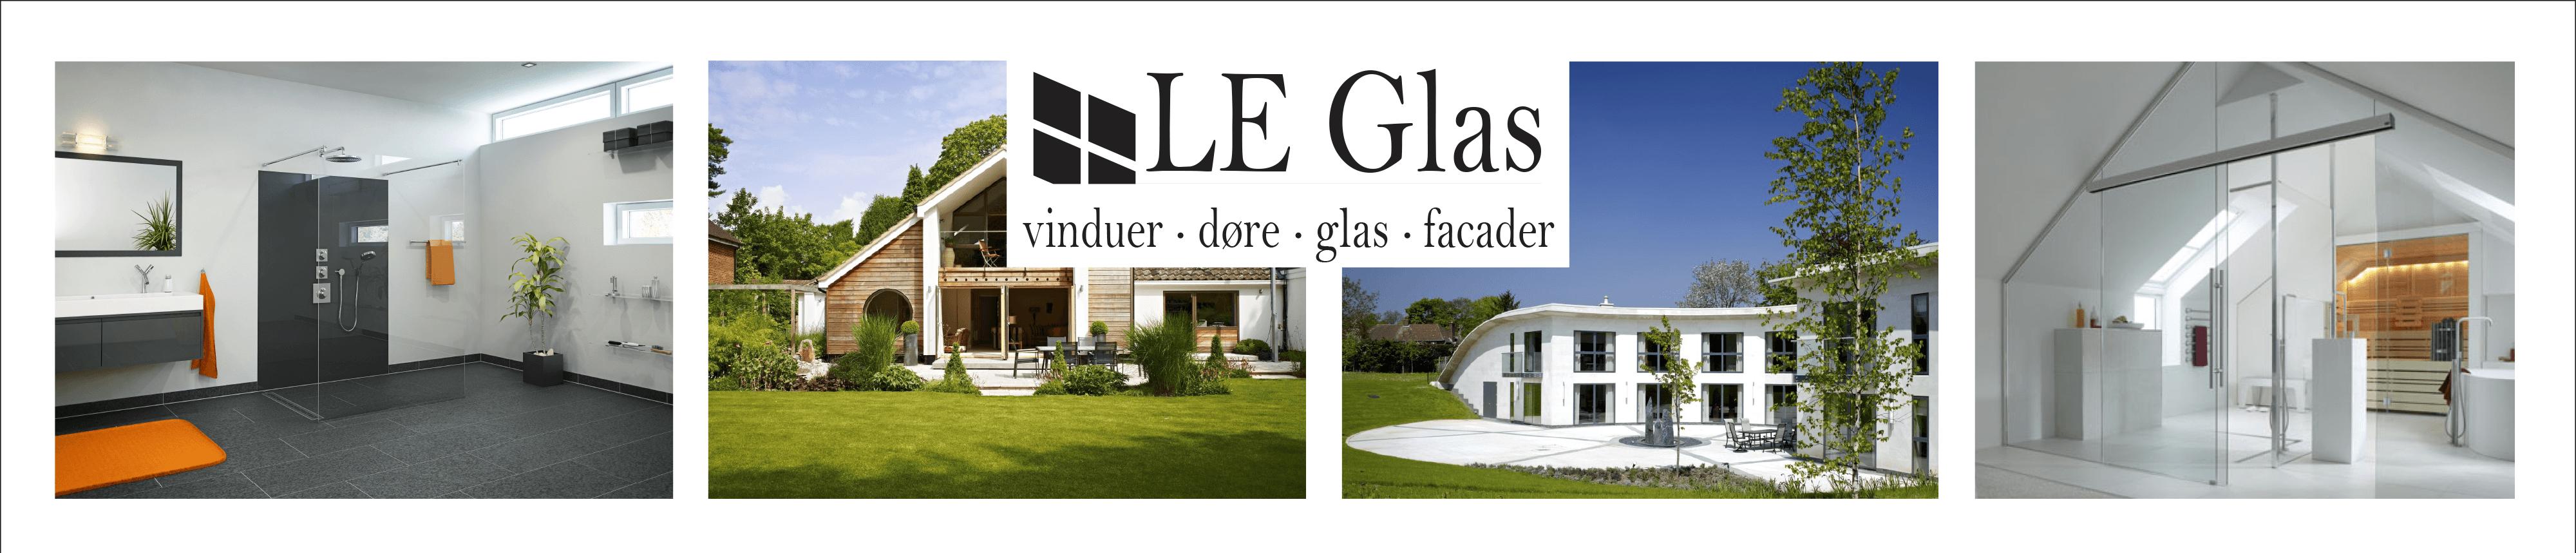 Glarmester LE Glas